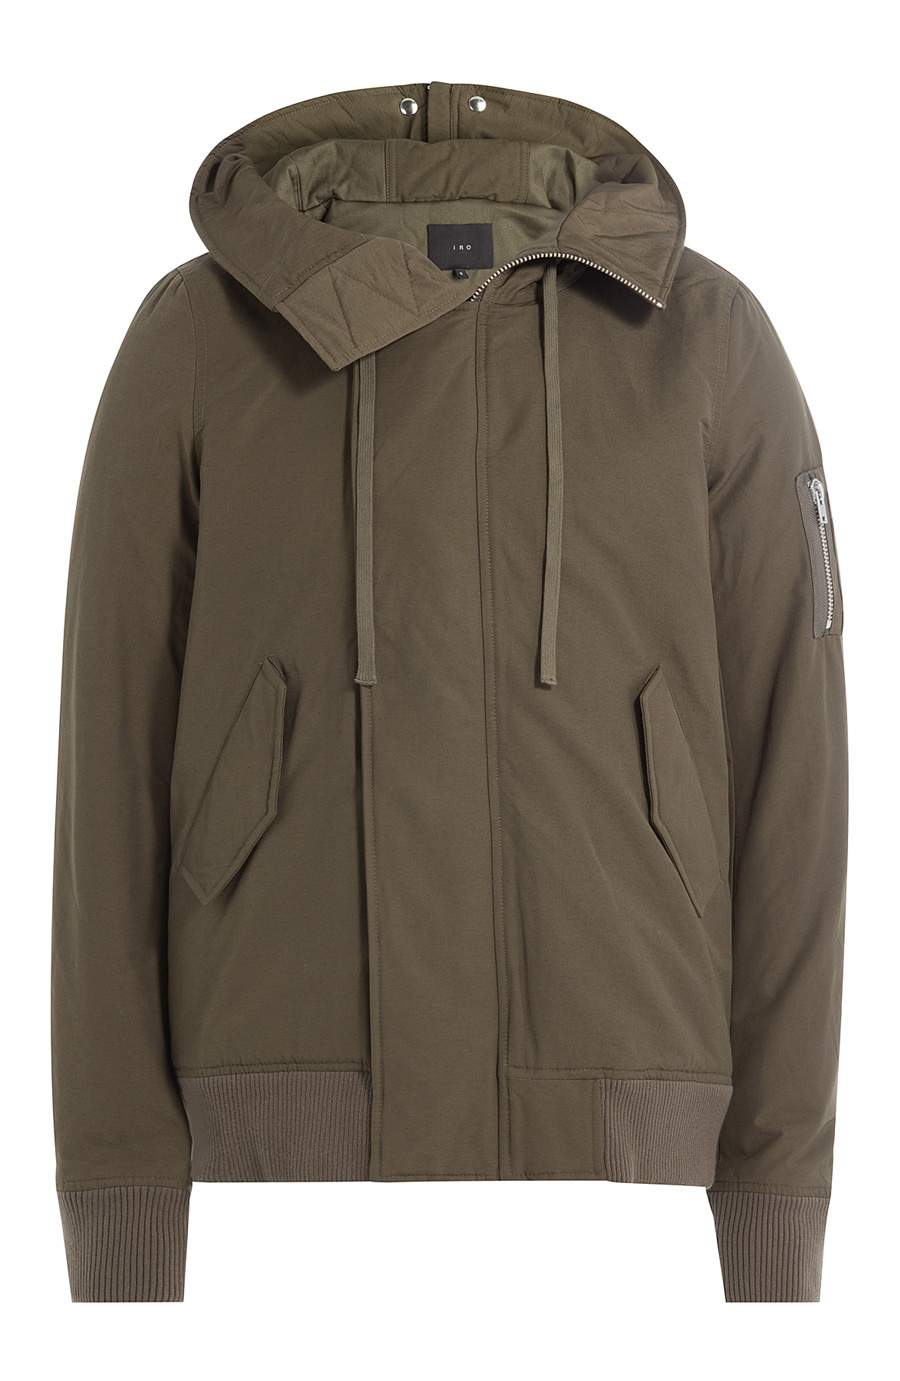 Iro Jacket With Hood In Green